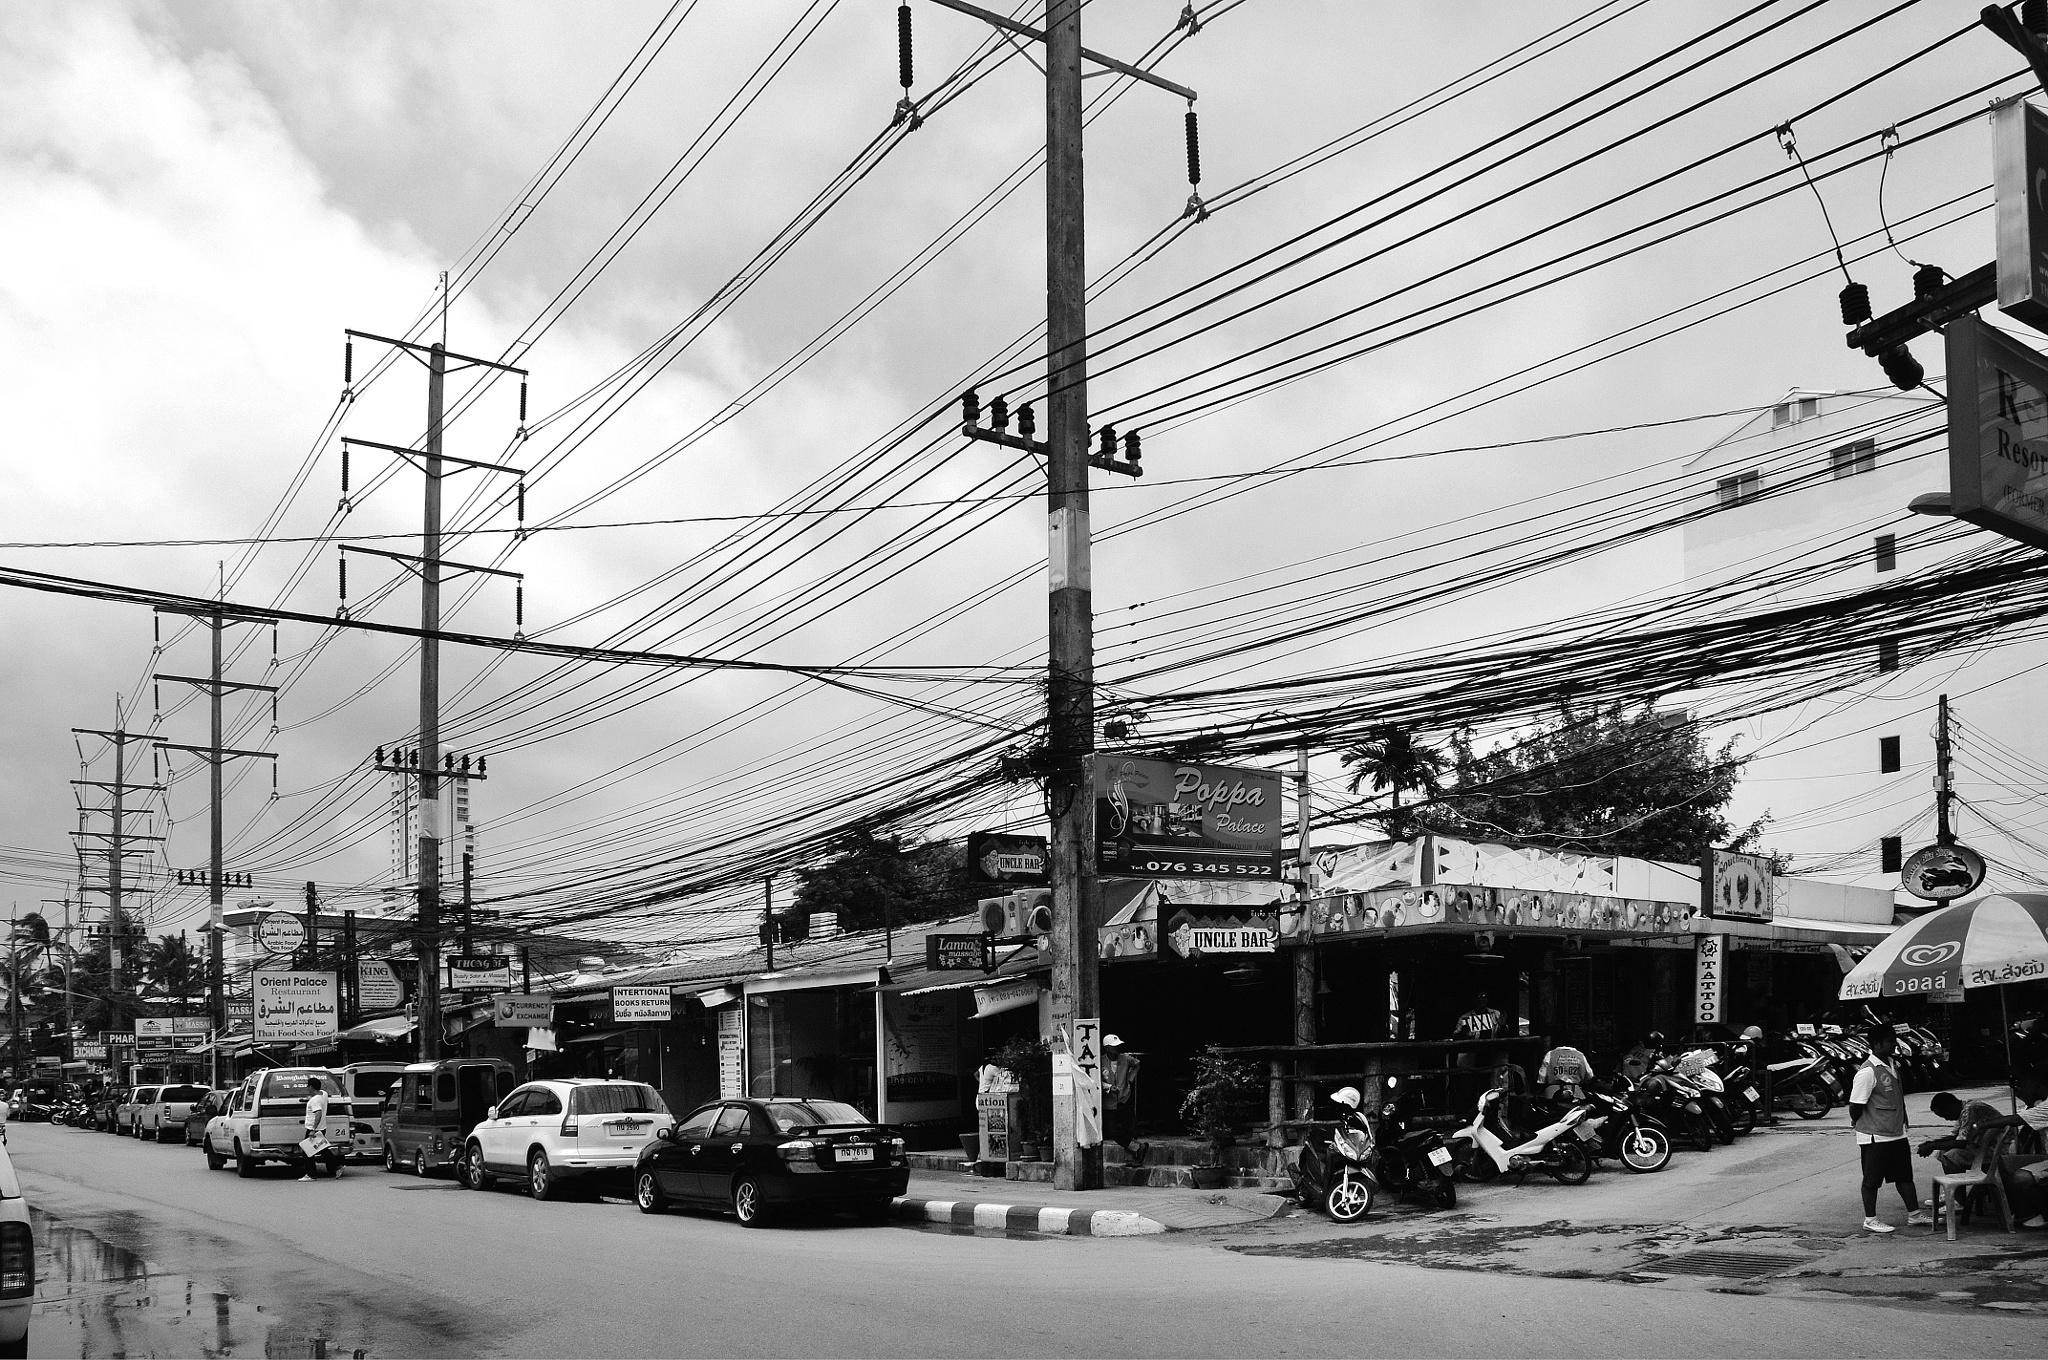 Streetview by Jan